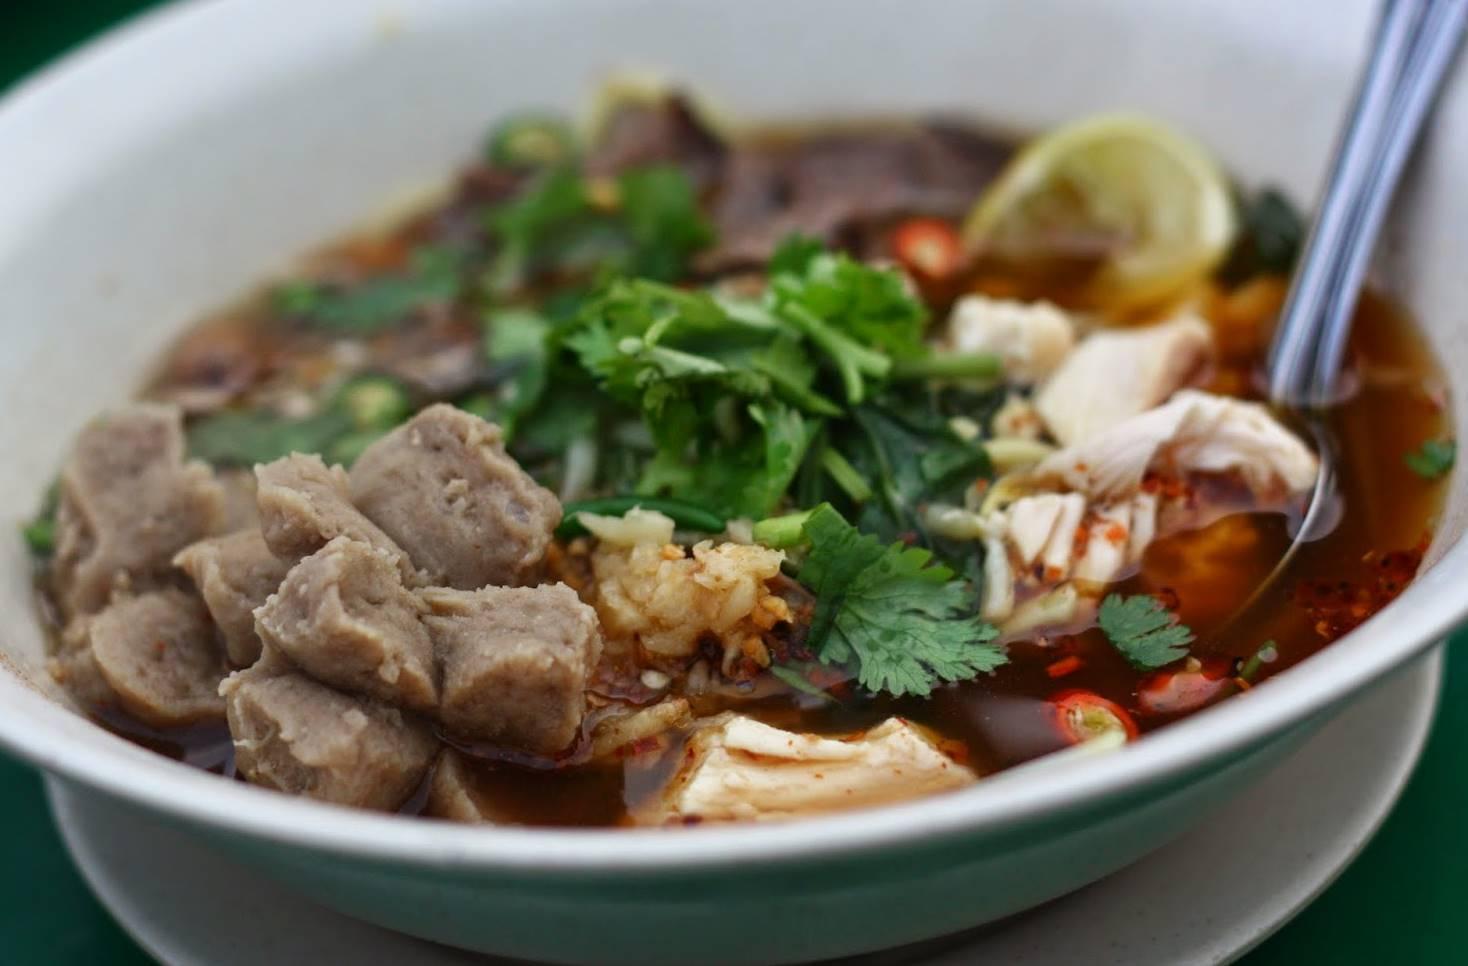 resepi mee celup kelantan  sedap  ringkas resepi masakan melayu Resepi Mee Celup Enak dan Mudah